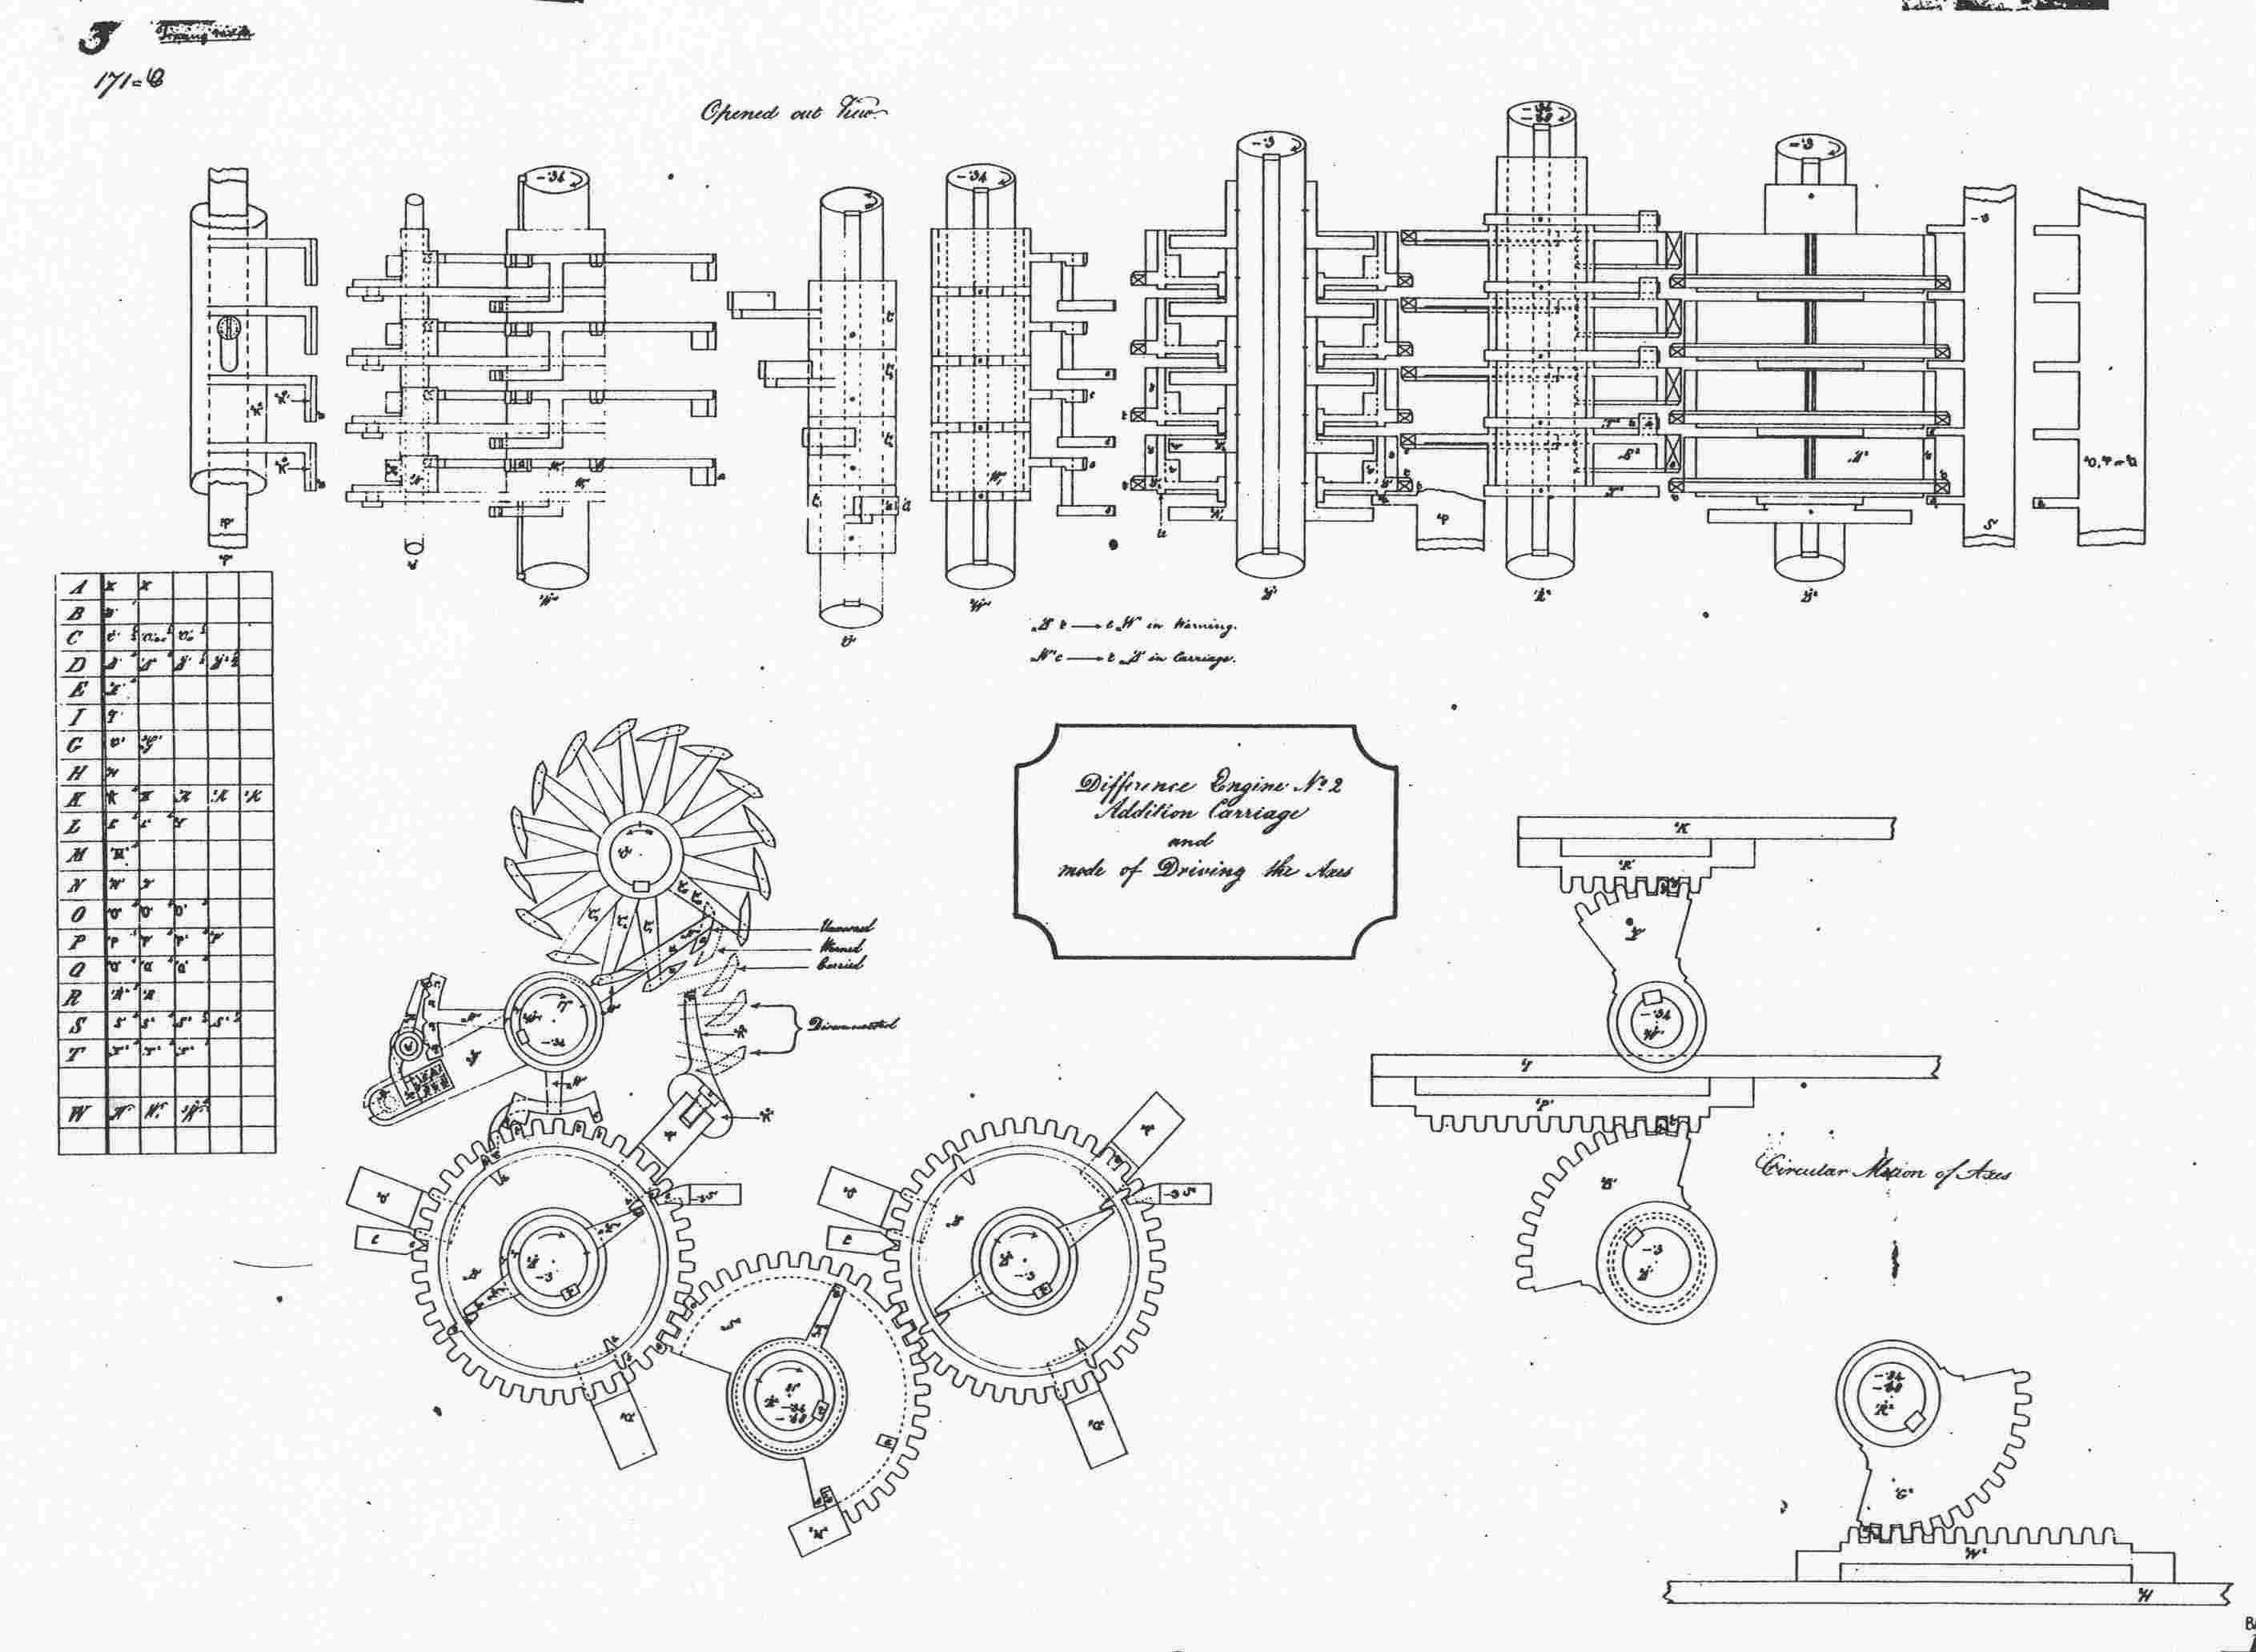 babbage analytical engine diagram